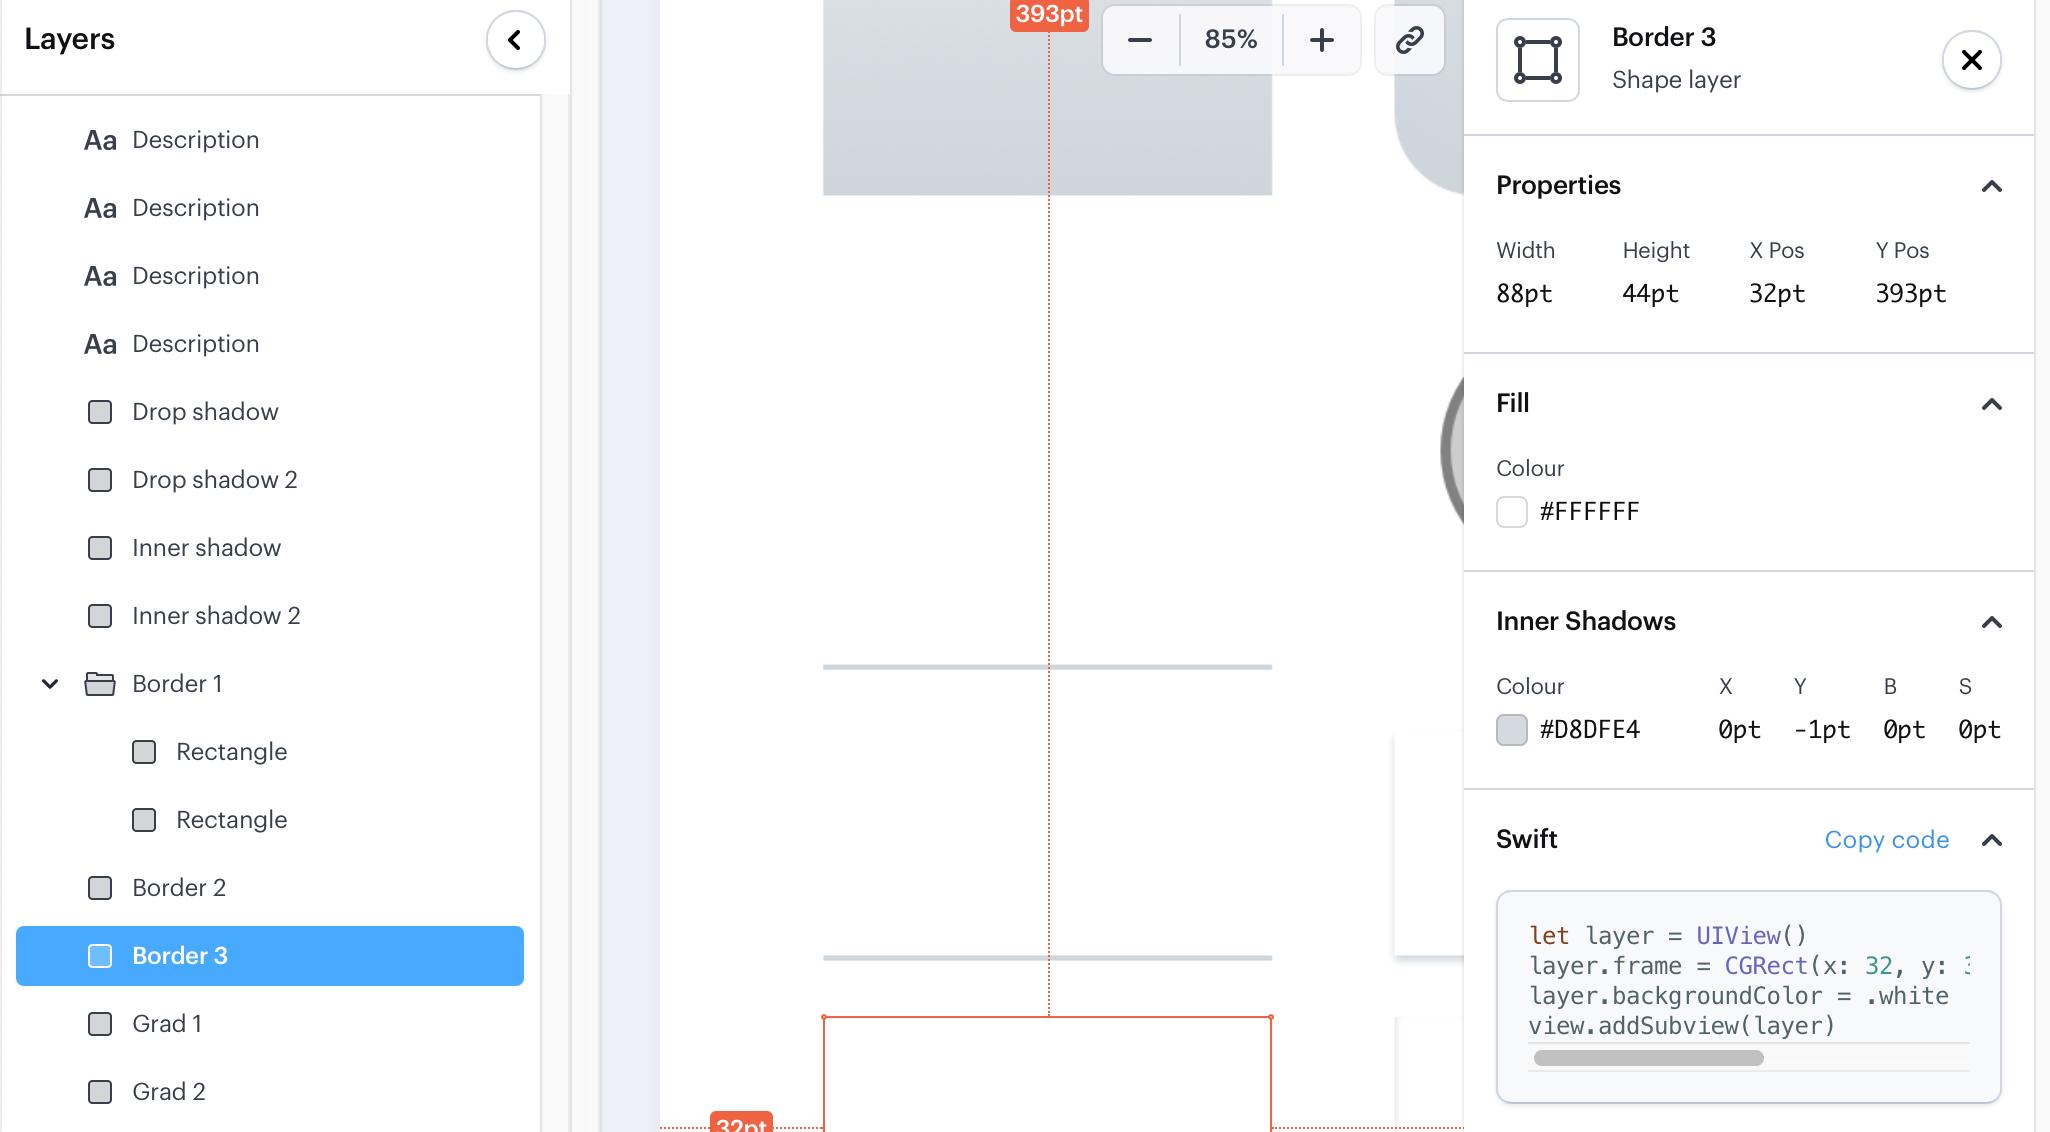 Marvel app: A rectangle with an inner shadow